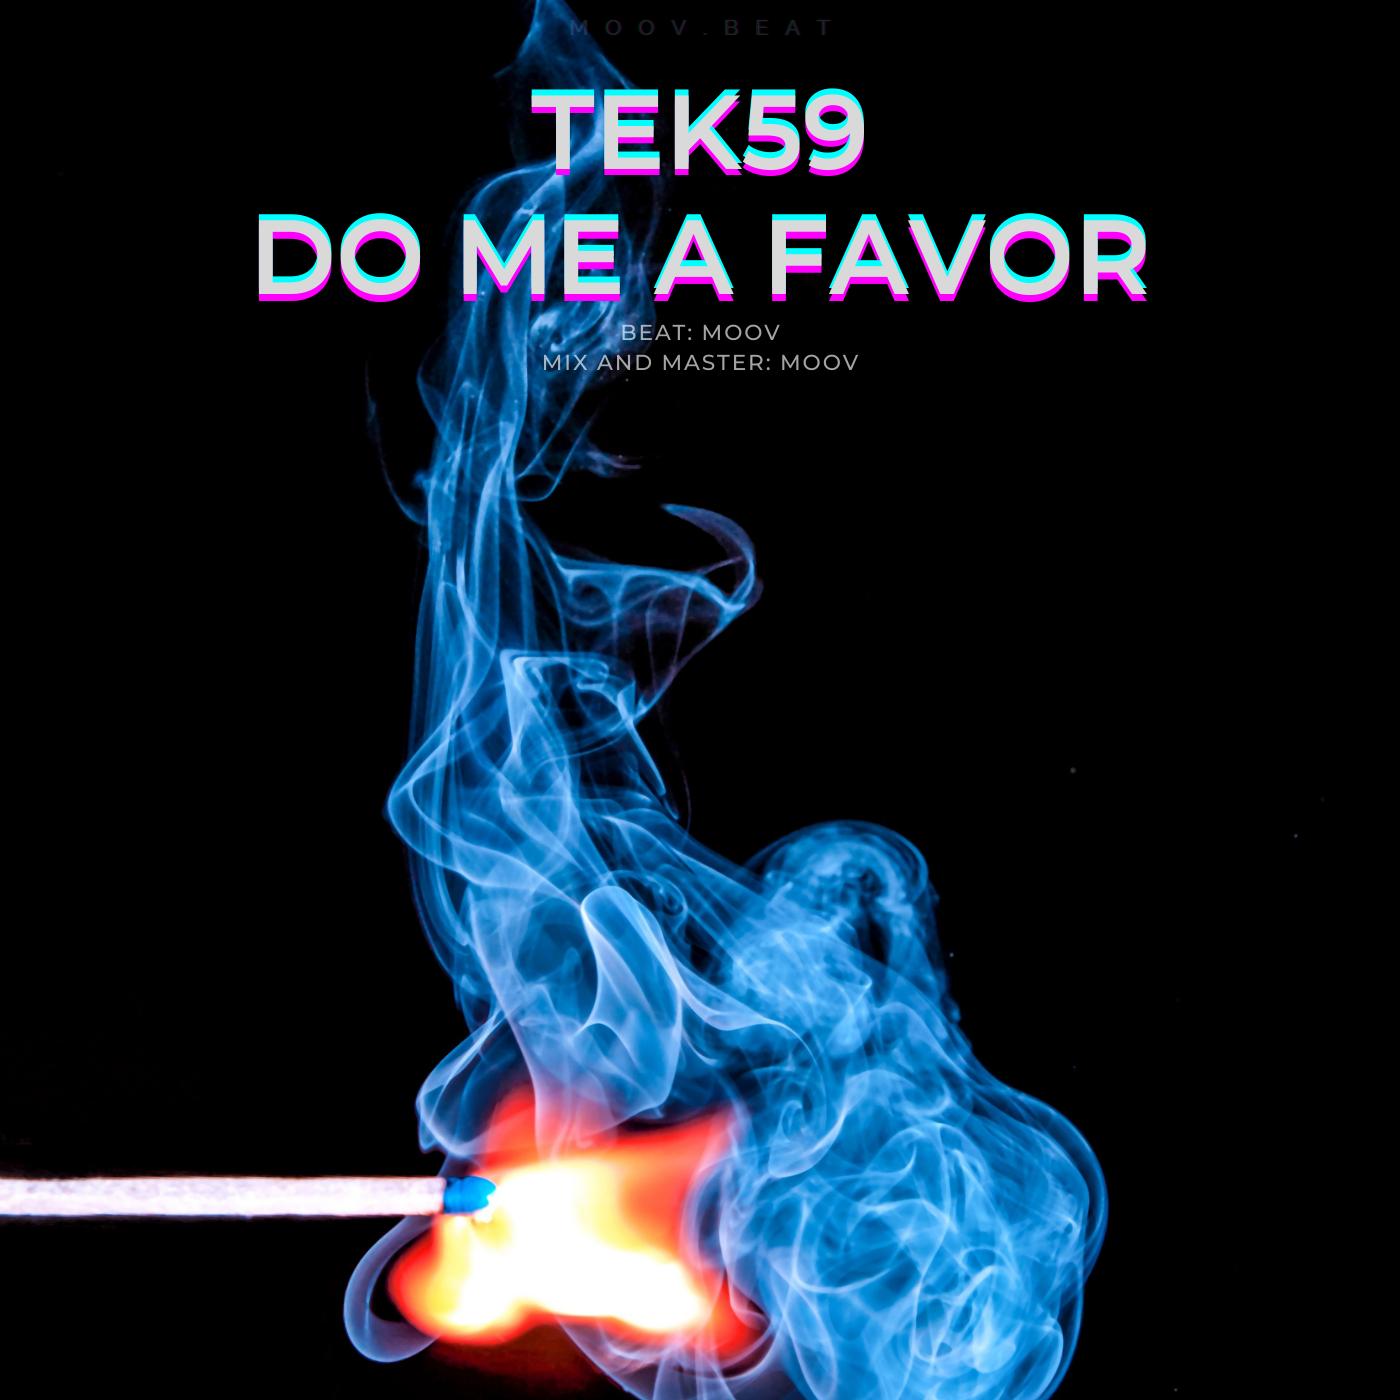 Do me a favor.png